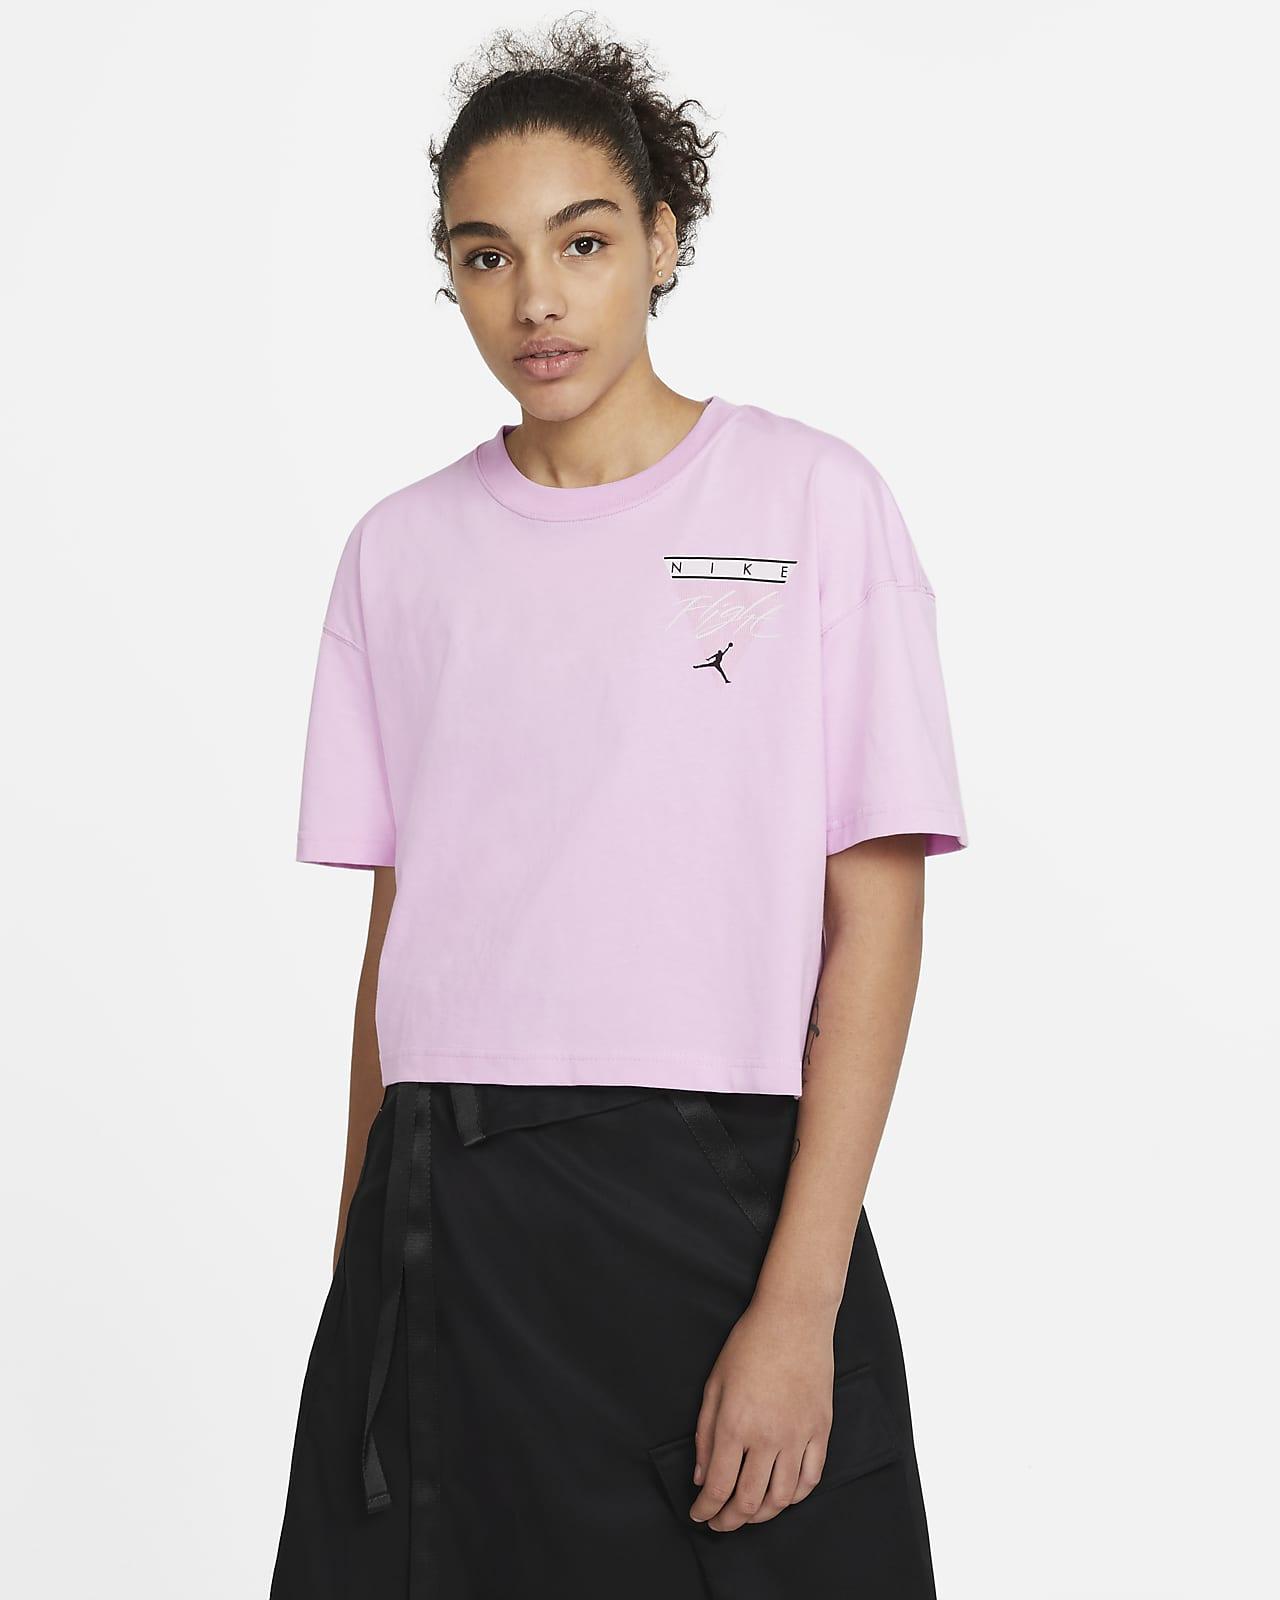 Jordan Essentials Women's Graphic T-Shirt